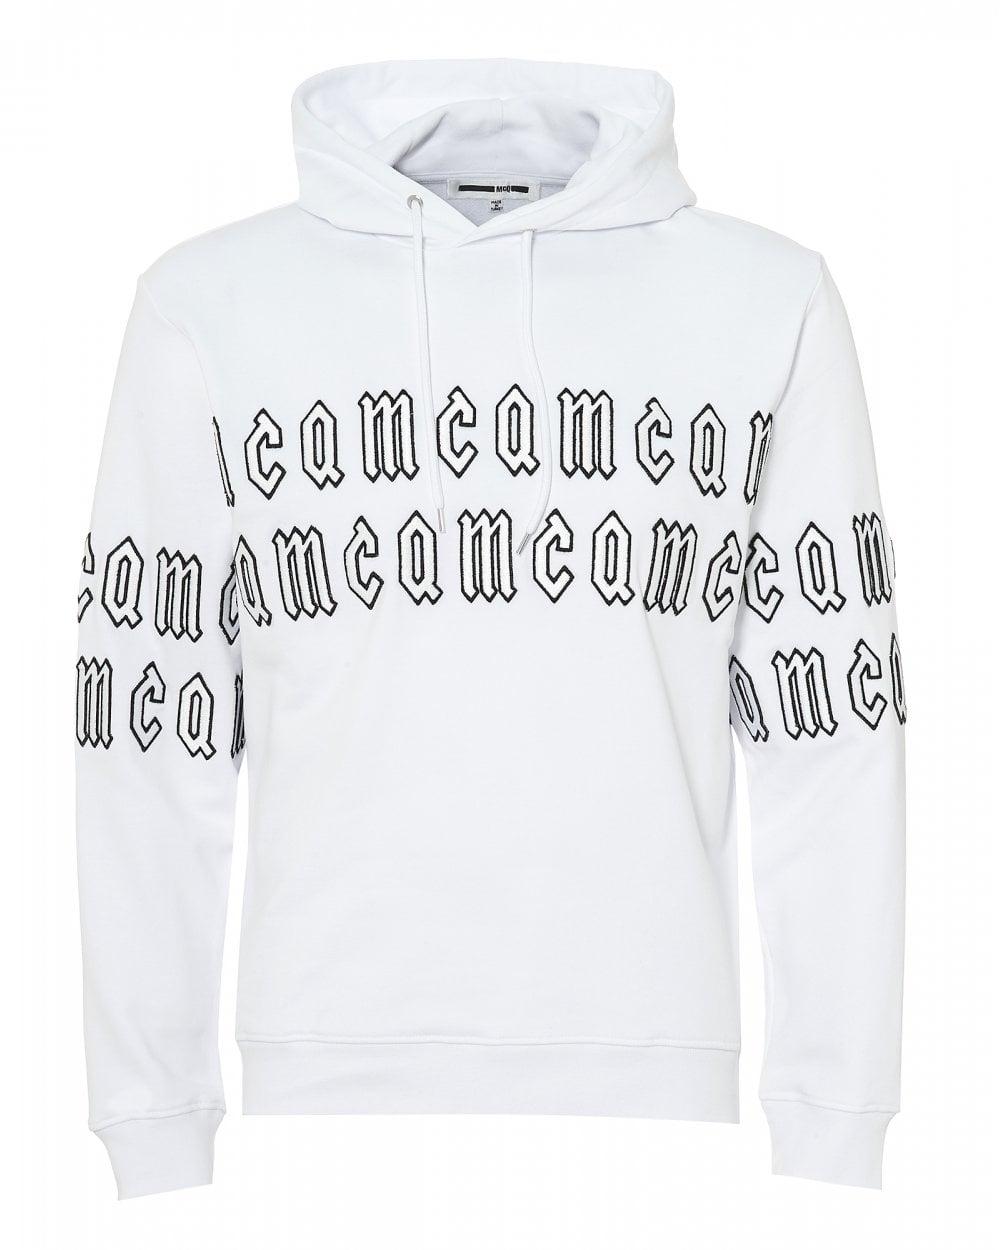 ca02929eda0b5 Mens Gothic Logo Hoodie, Optic White Hooded Sweatshirt